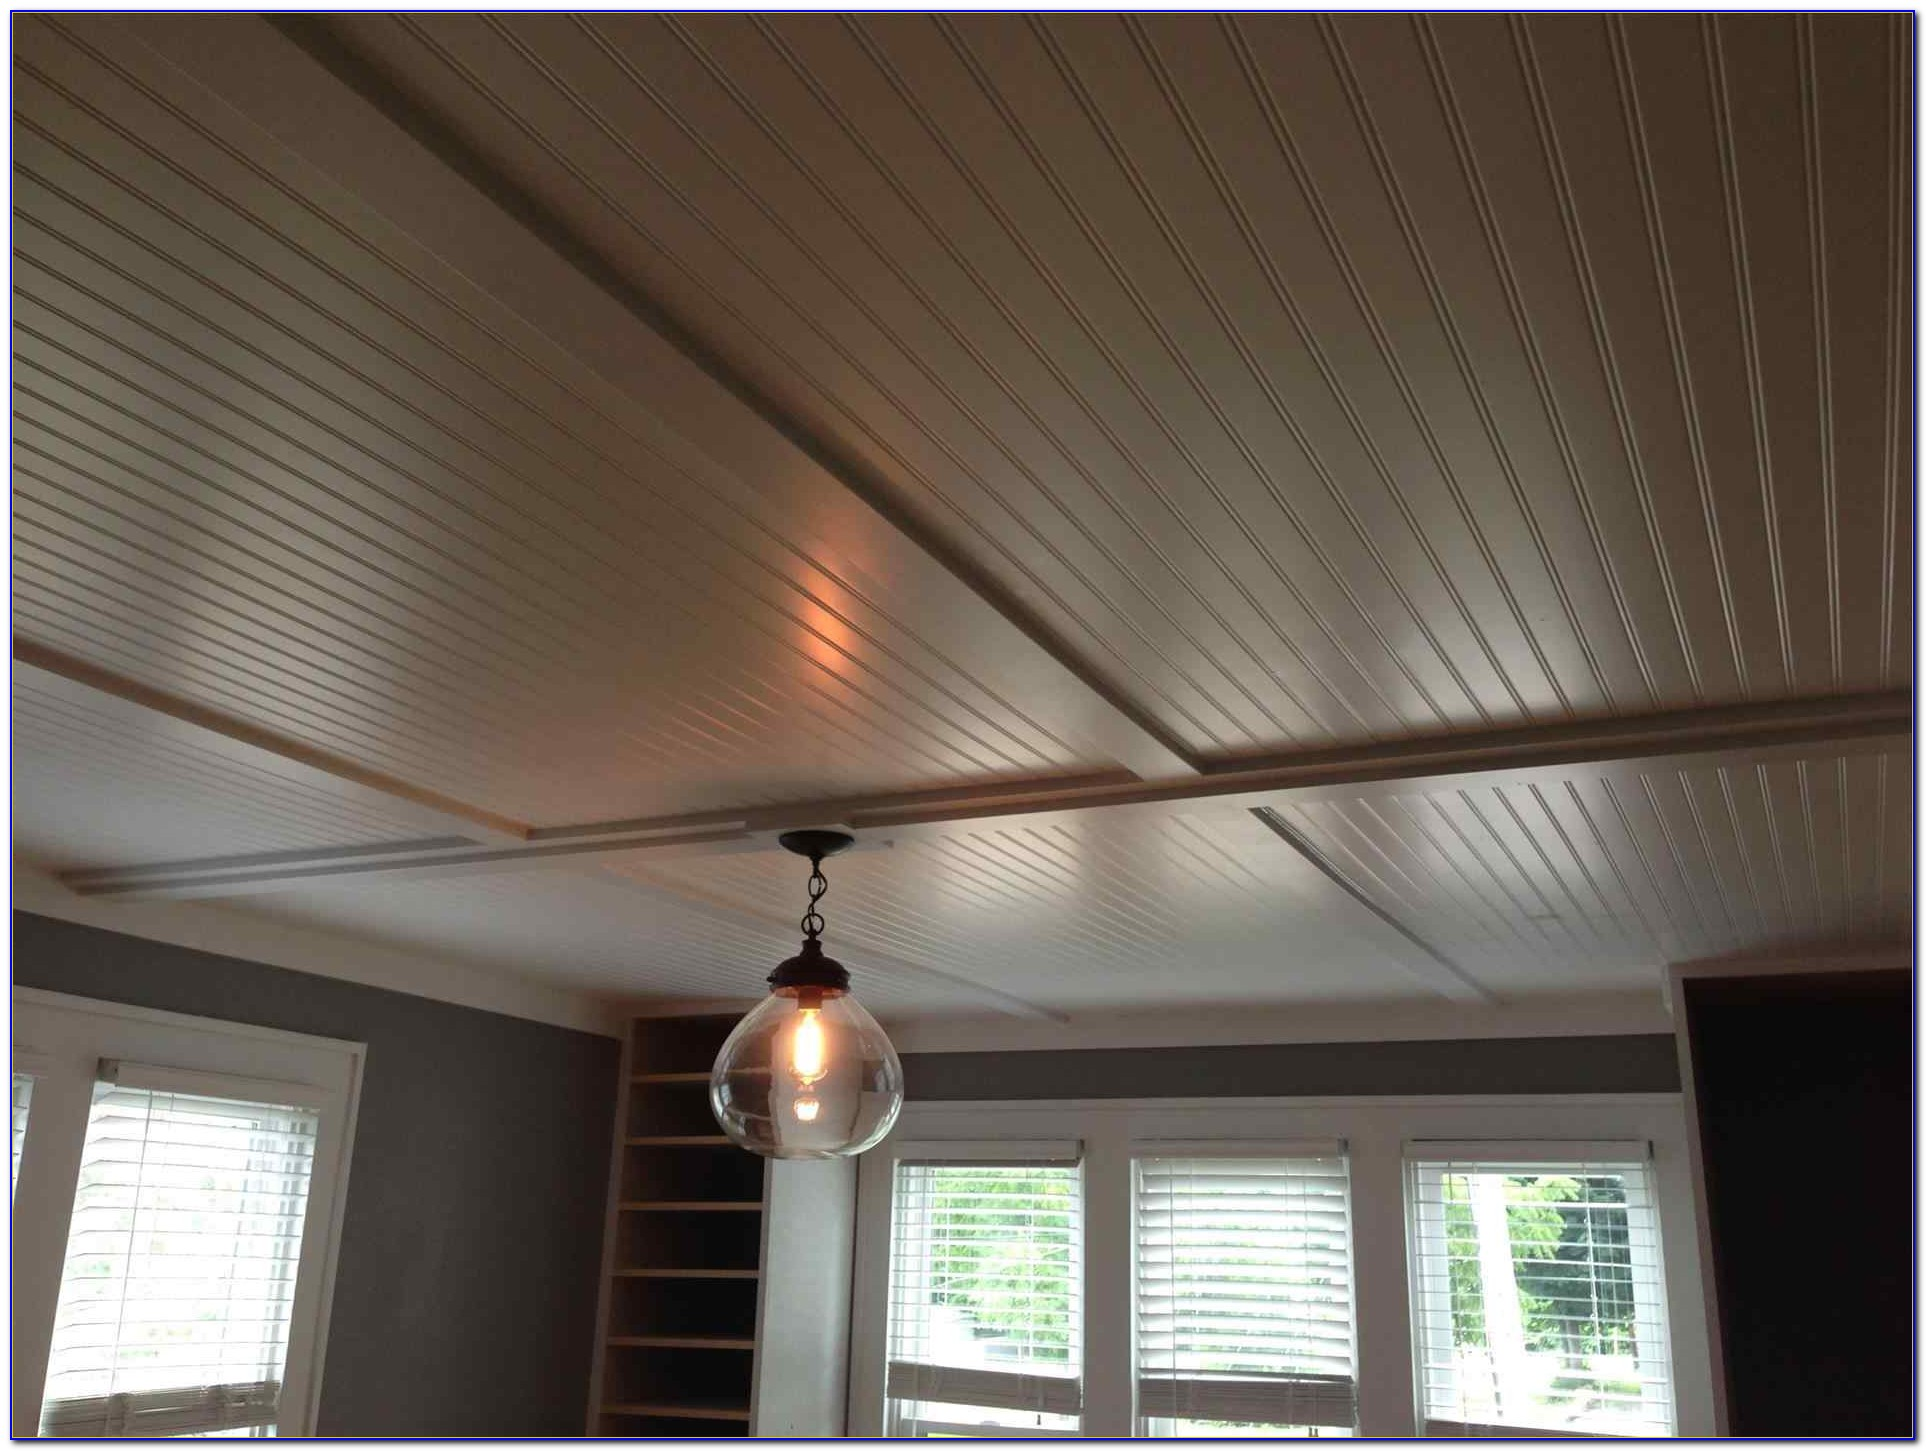 Heat Vents In Drop Ceiling